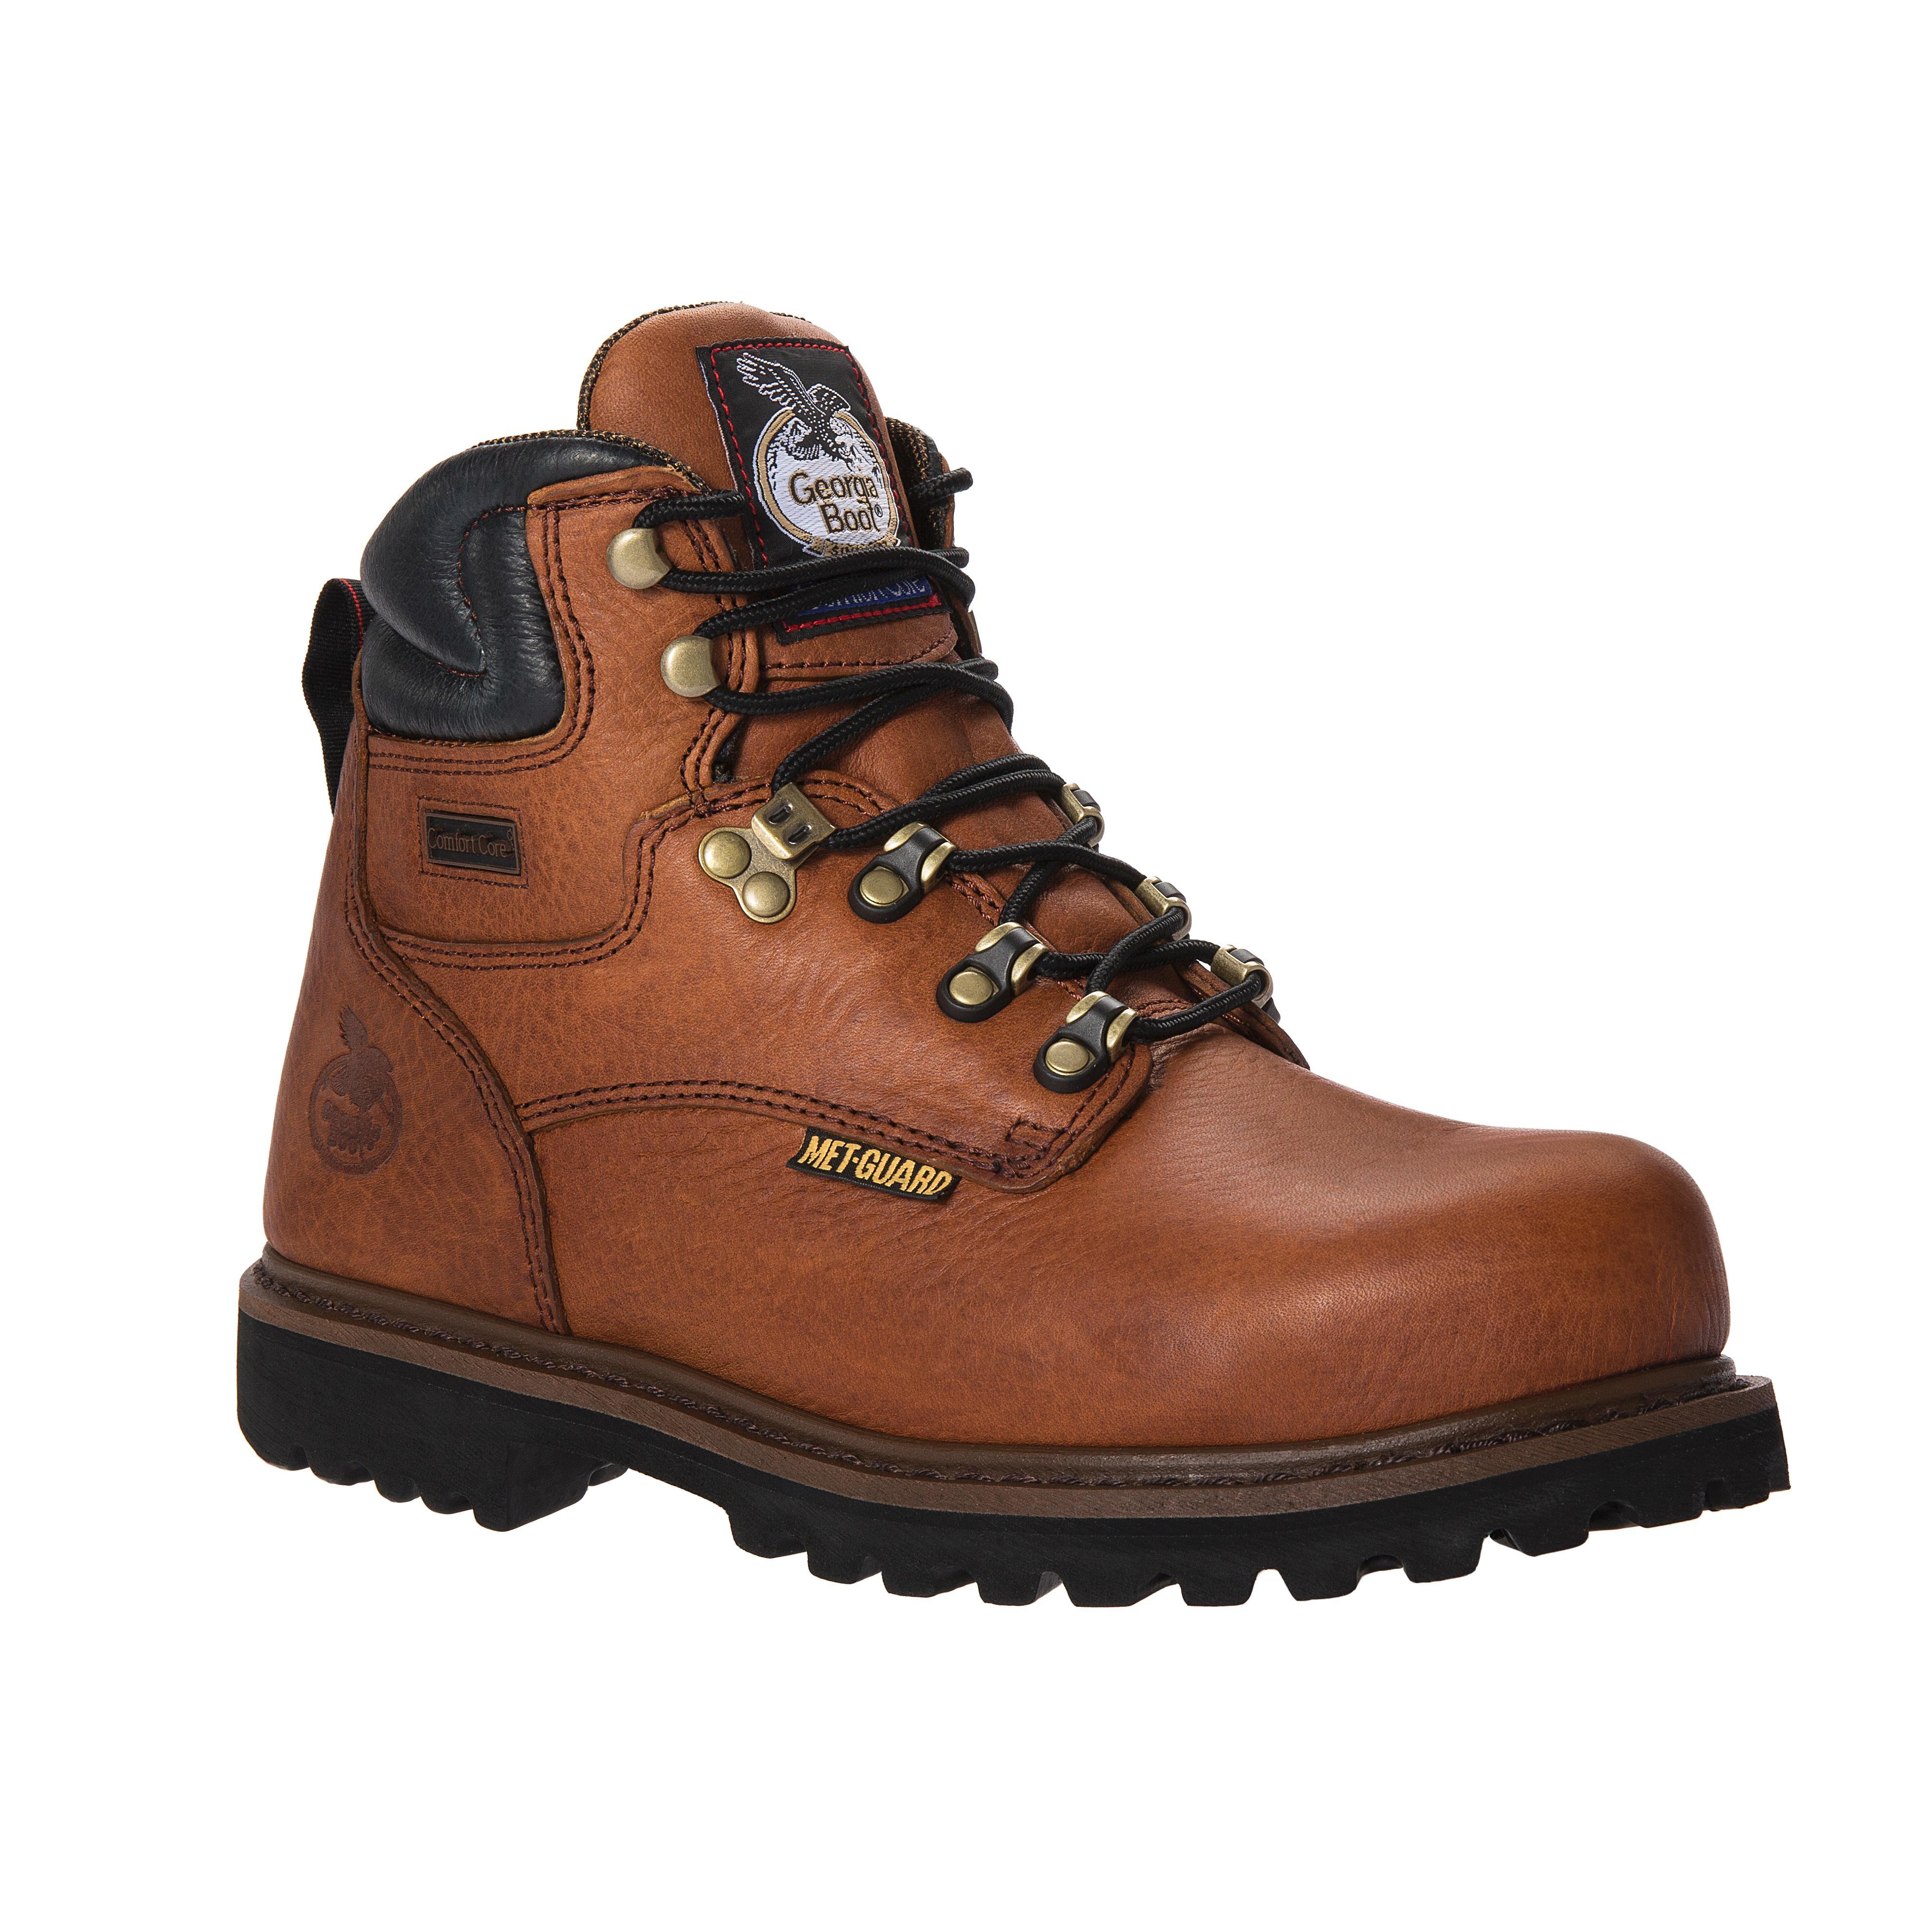 d8d97379e1b Georgia Boot Hammer Internal Metatarsal Steel Toe Work Boot